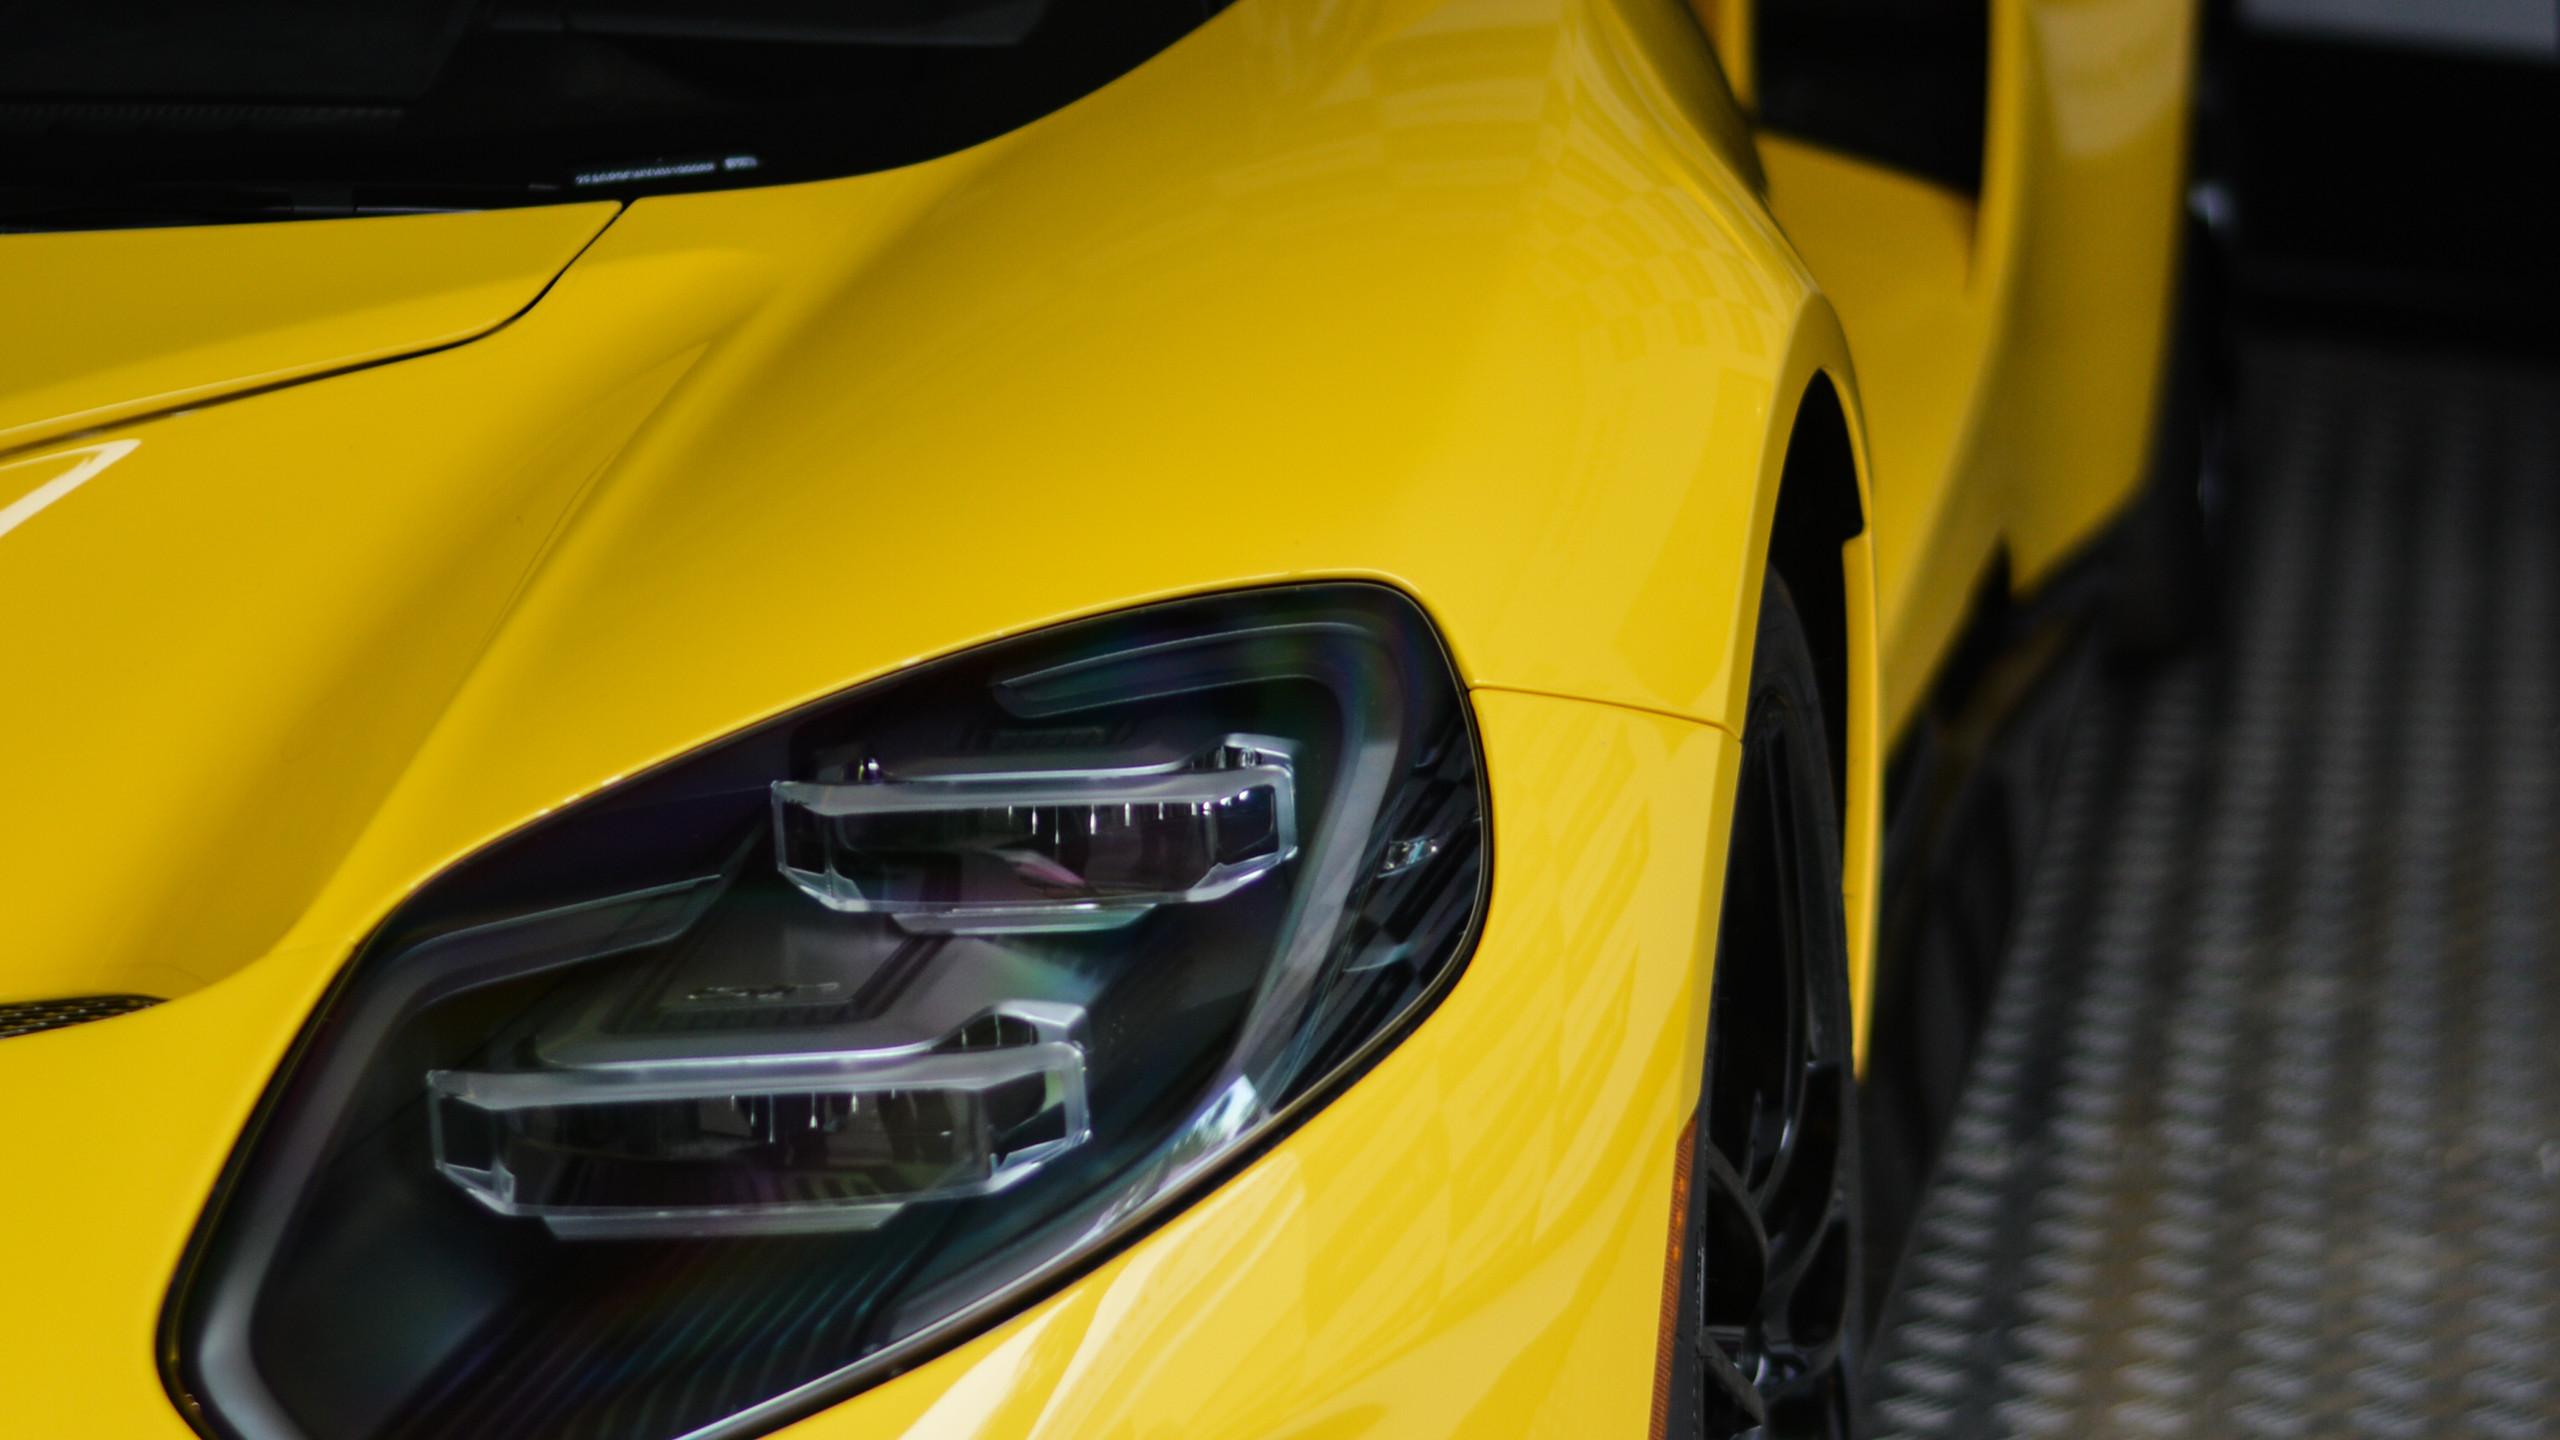 This new model features extravagant headlight design